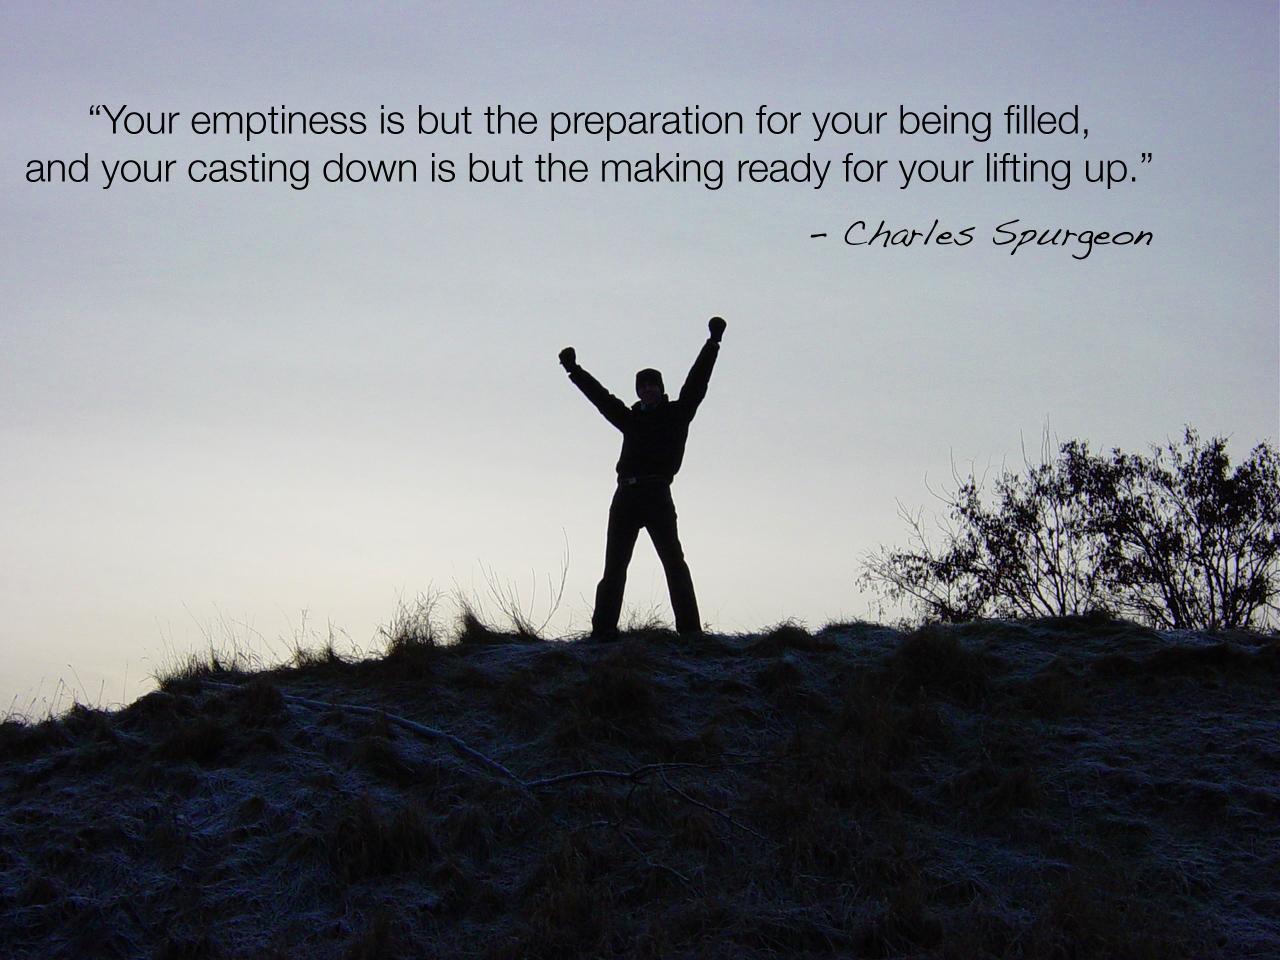 Charles Spurgeon's quote #6